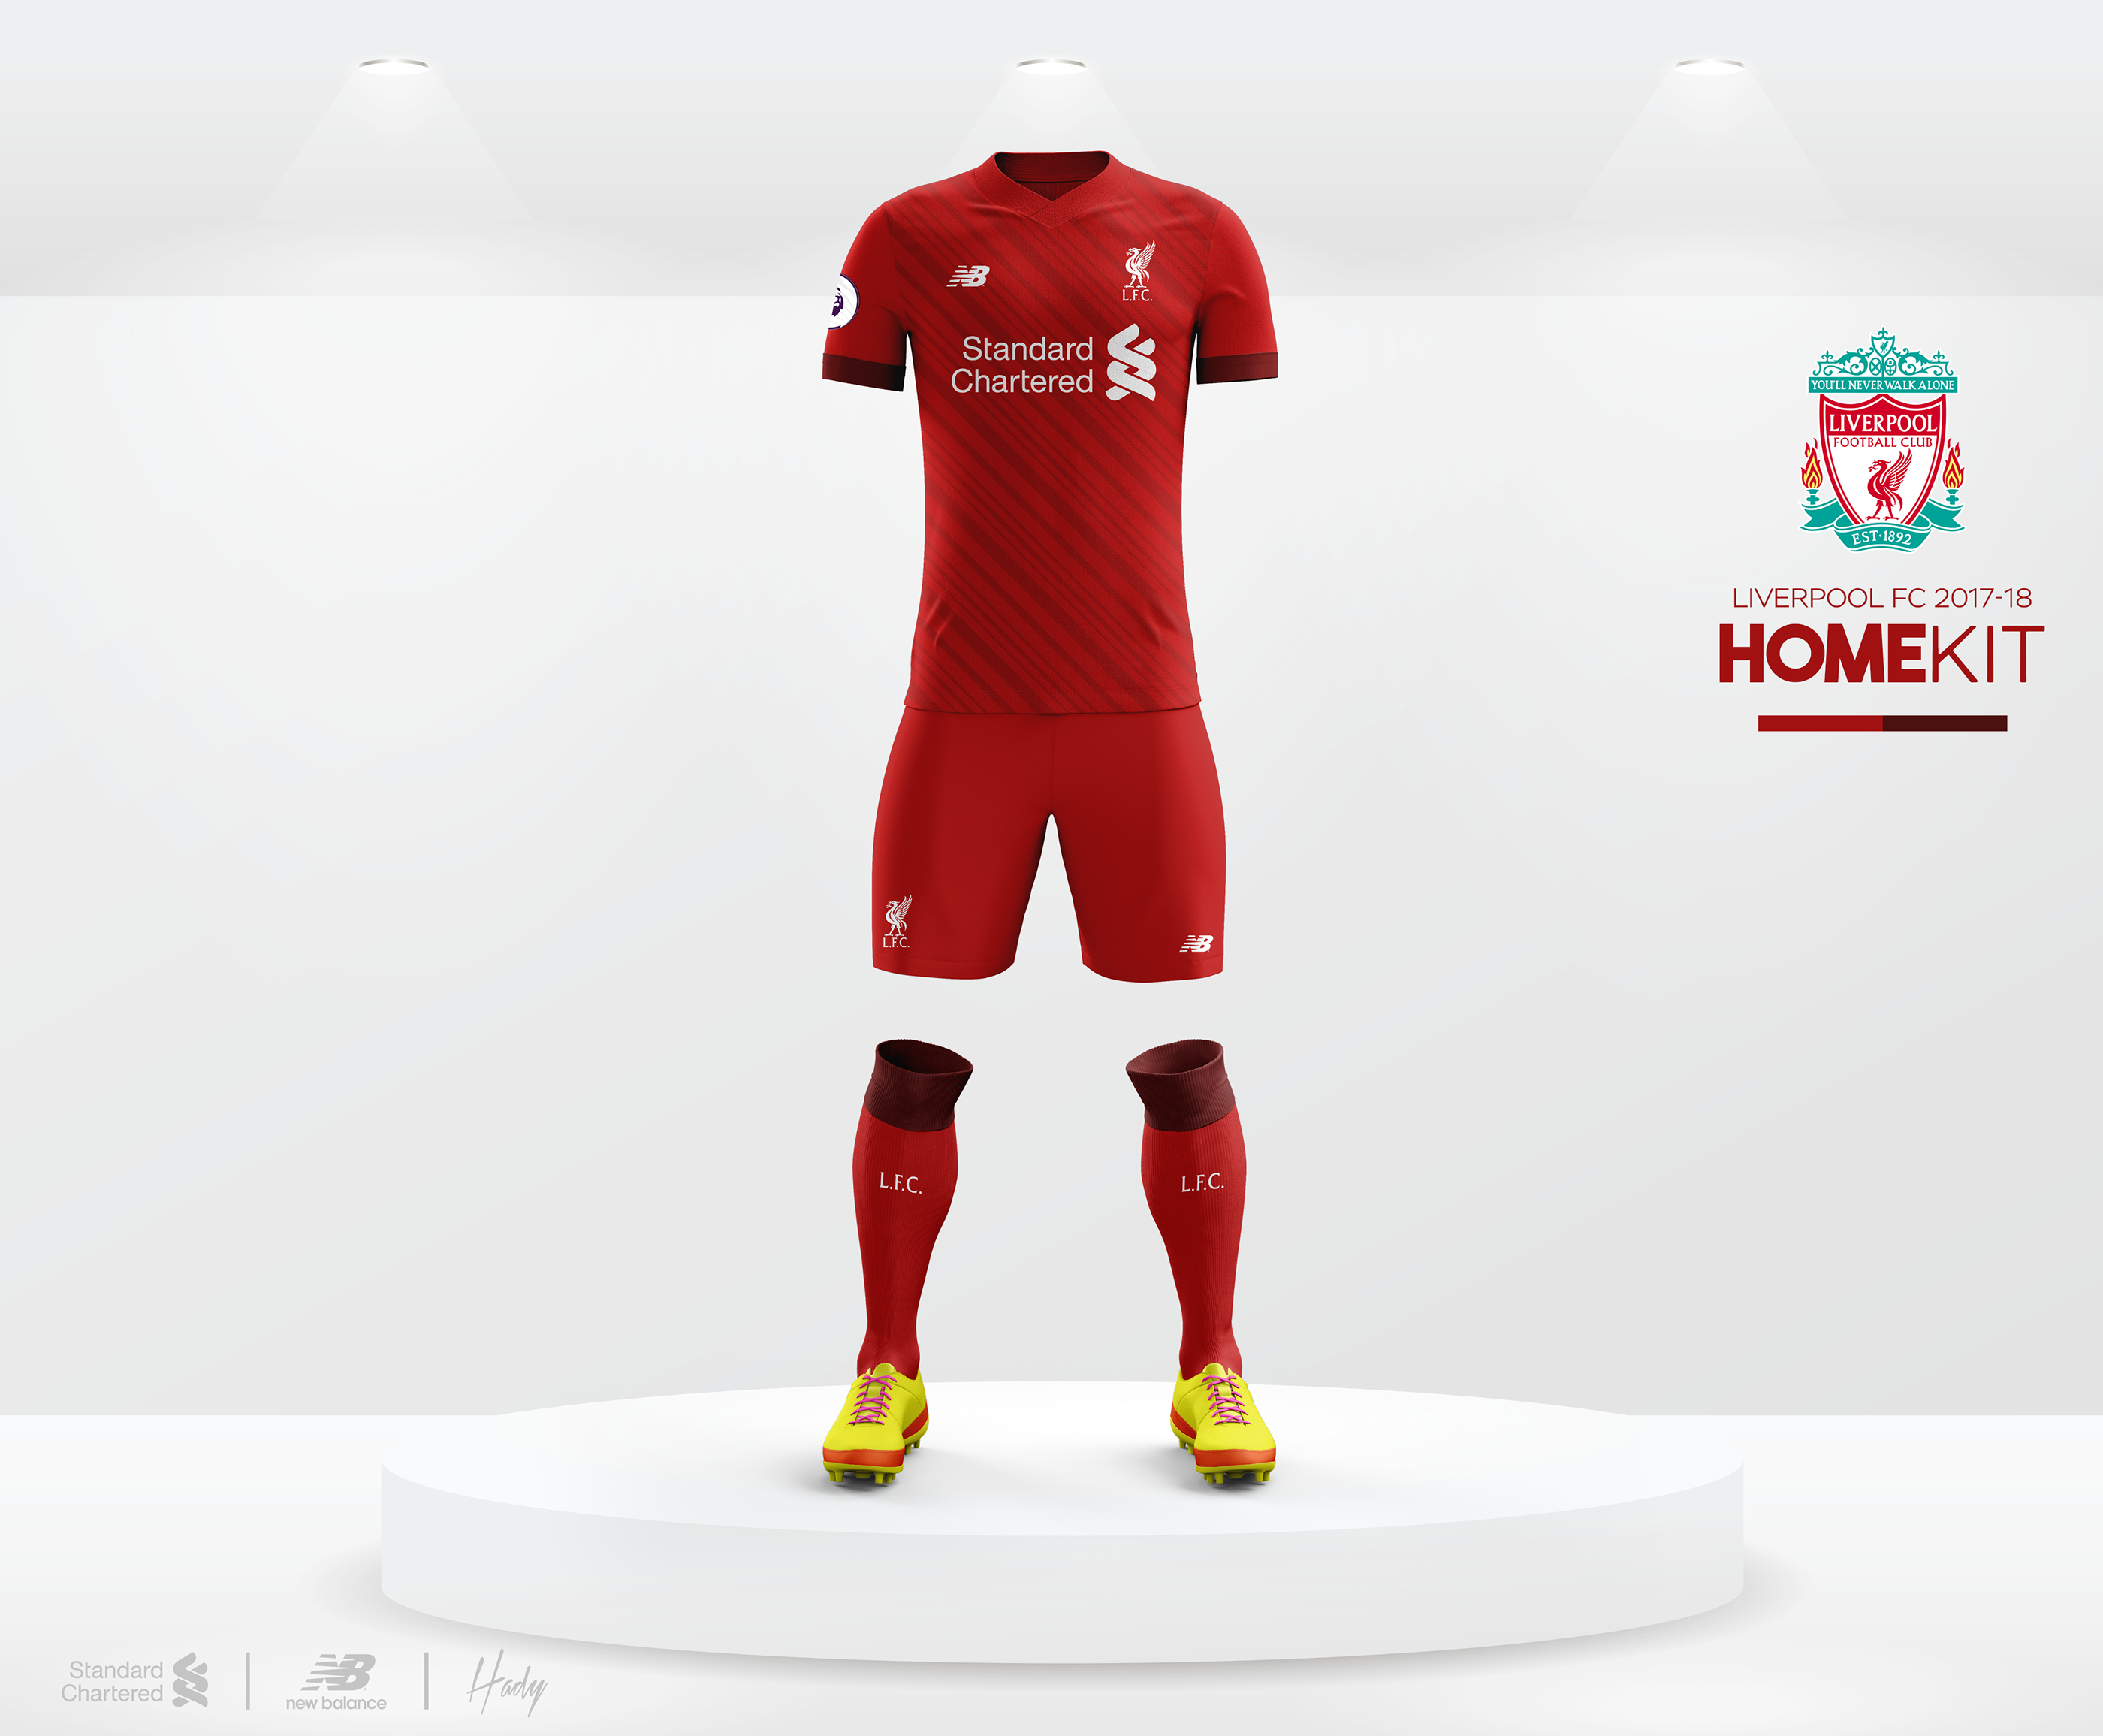 1265051b8 Liverpool FC 2017-18 Kits Concept. on Behance